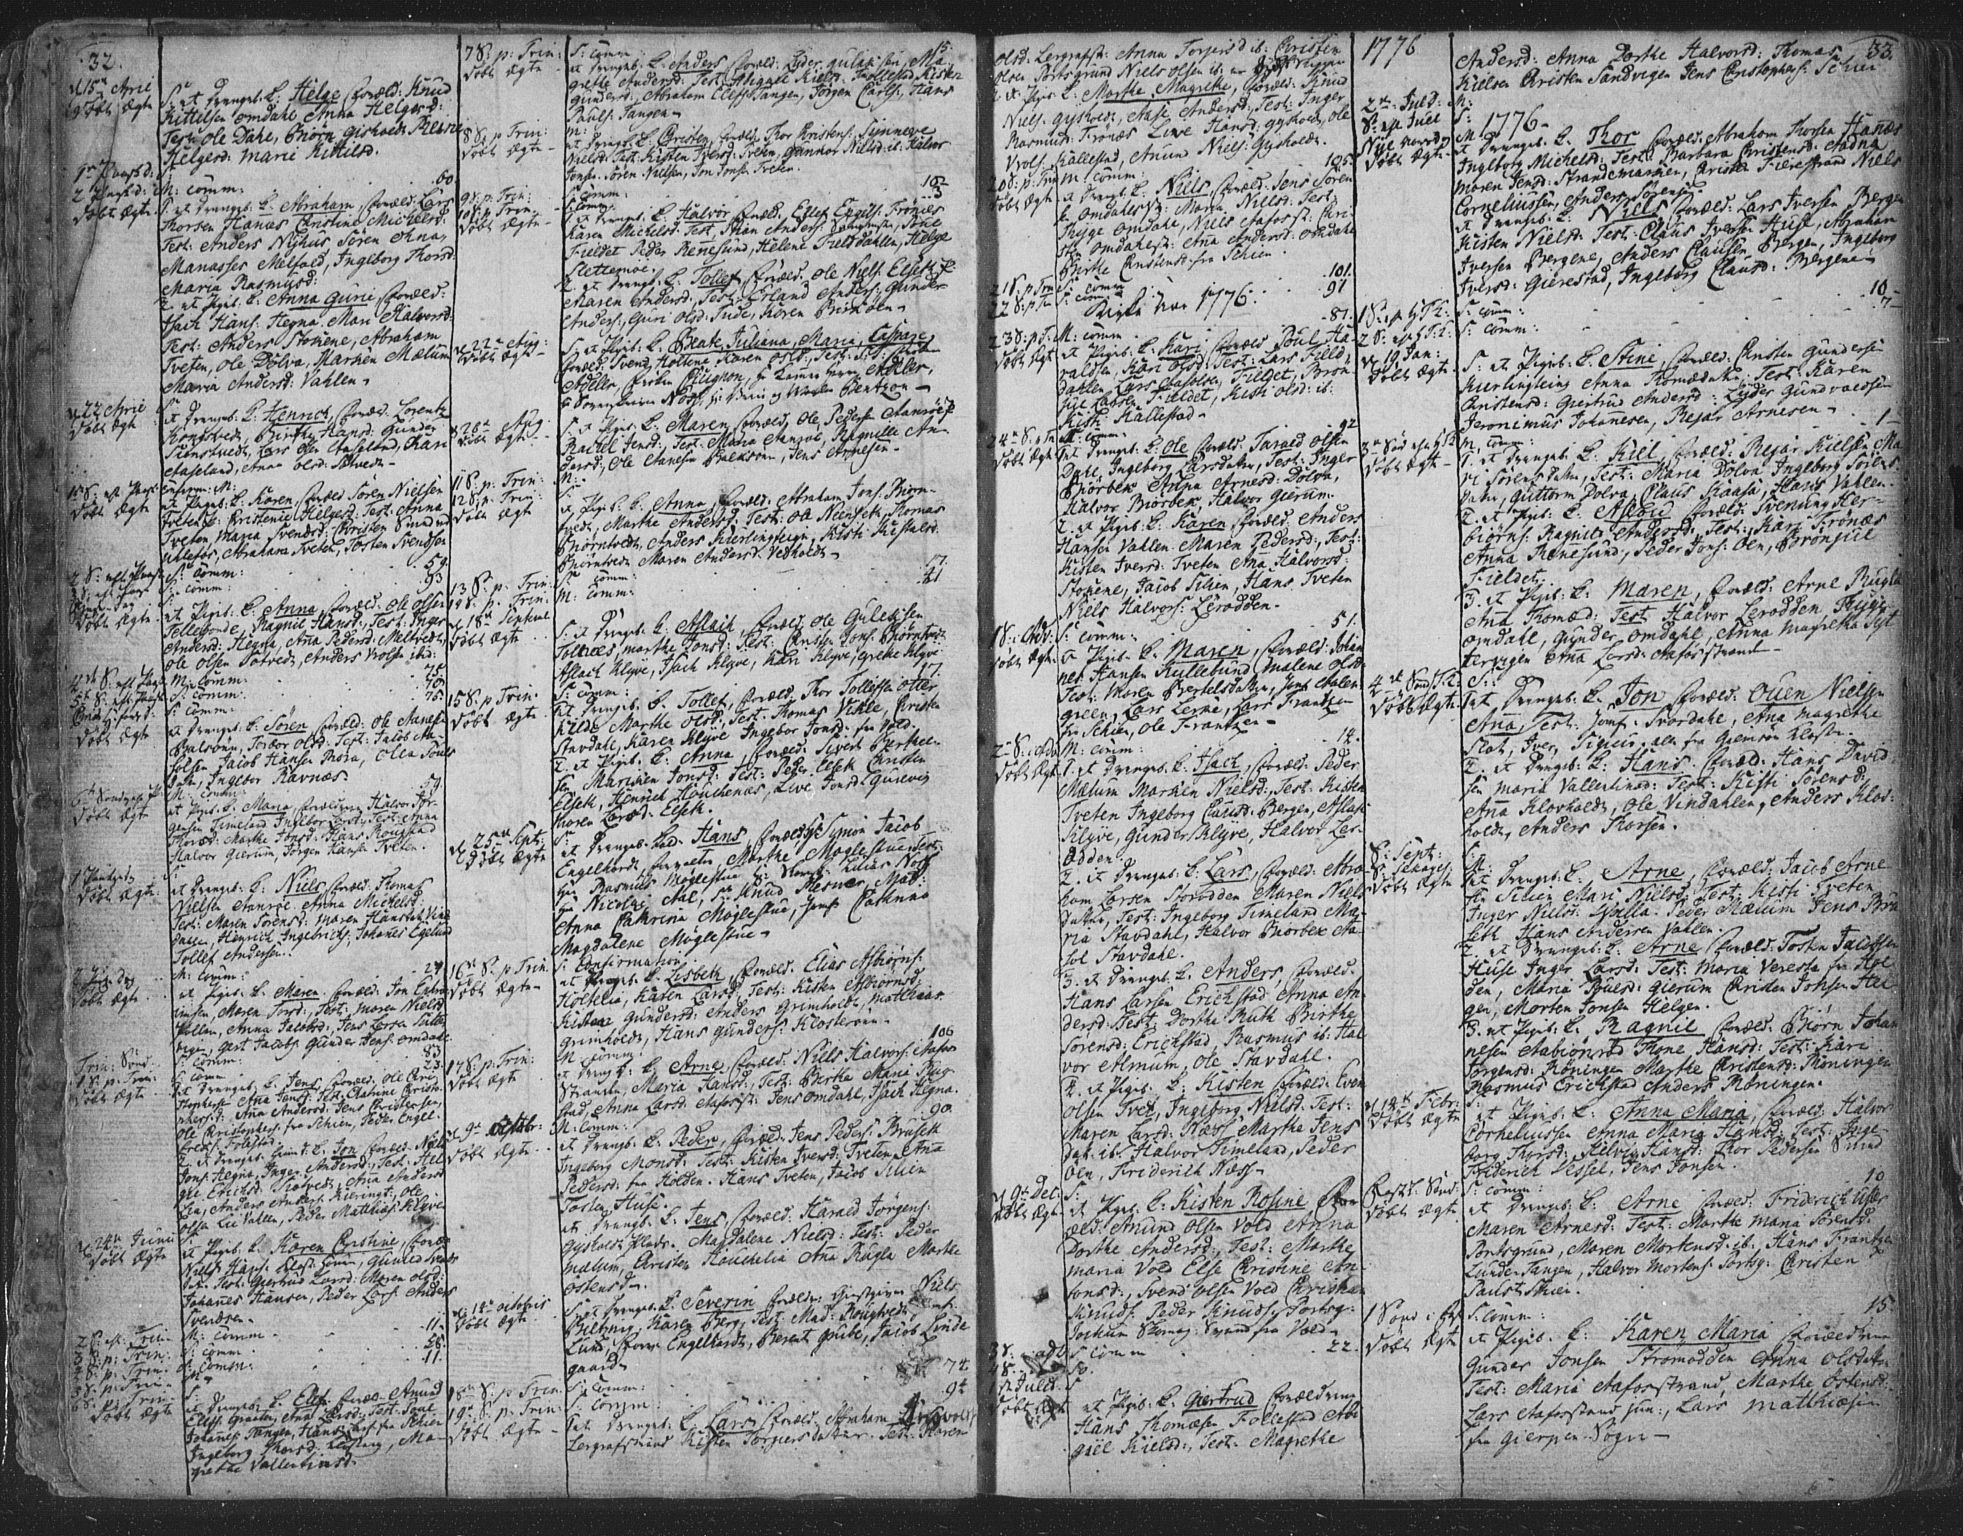 SAKO, Solum kirkebøker, F/Fa/L0003: Ministerialbok nr. I 3, 1761-1814, s. 32-33